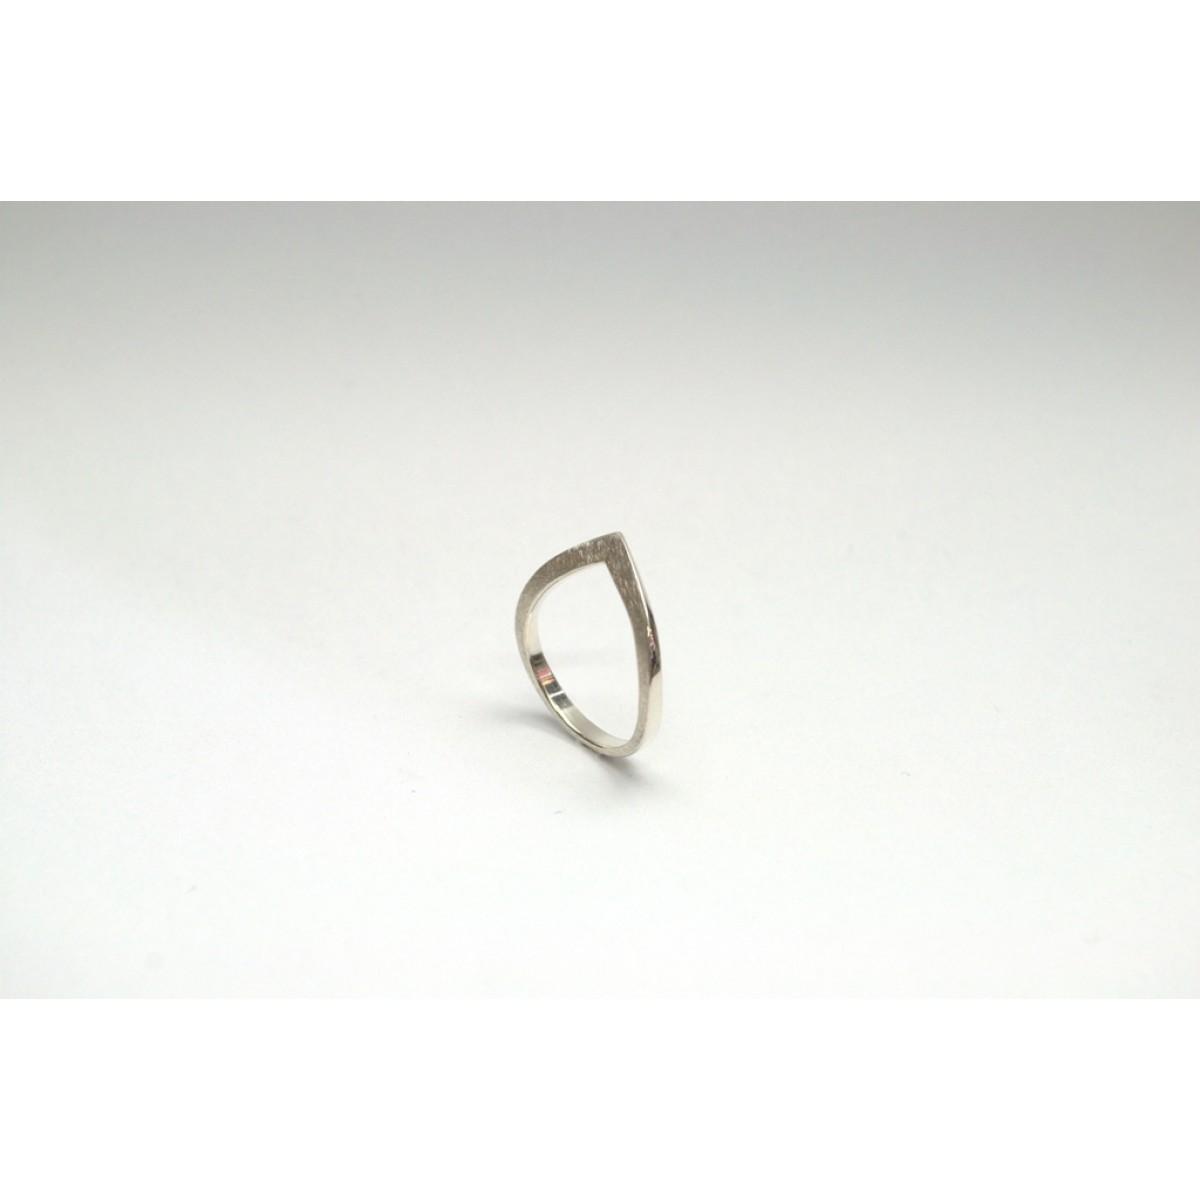 "DOPPELLUDWIG – Ring ""AUFGESTELLT"" aus 925/- Silber"